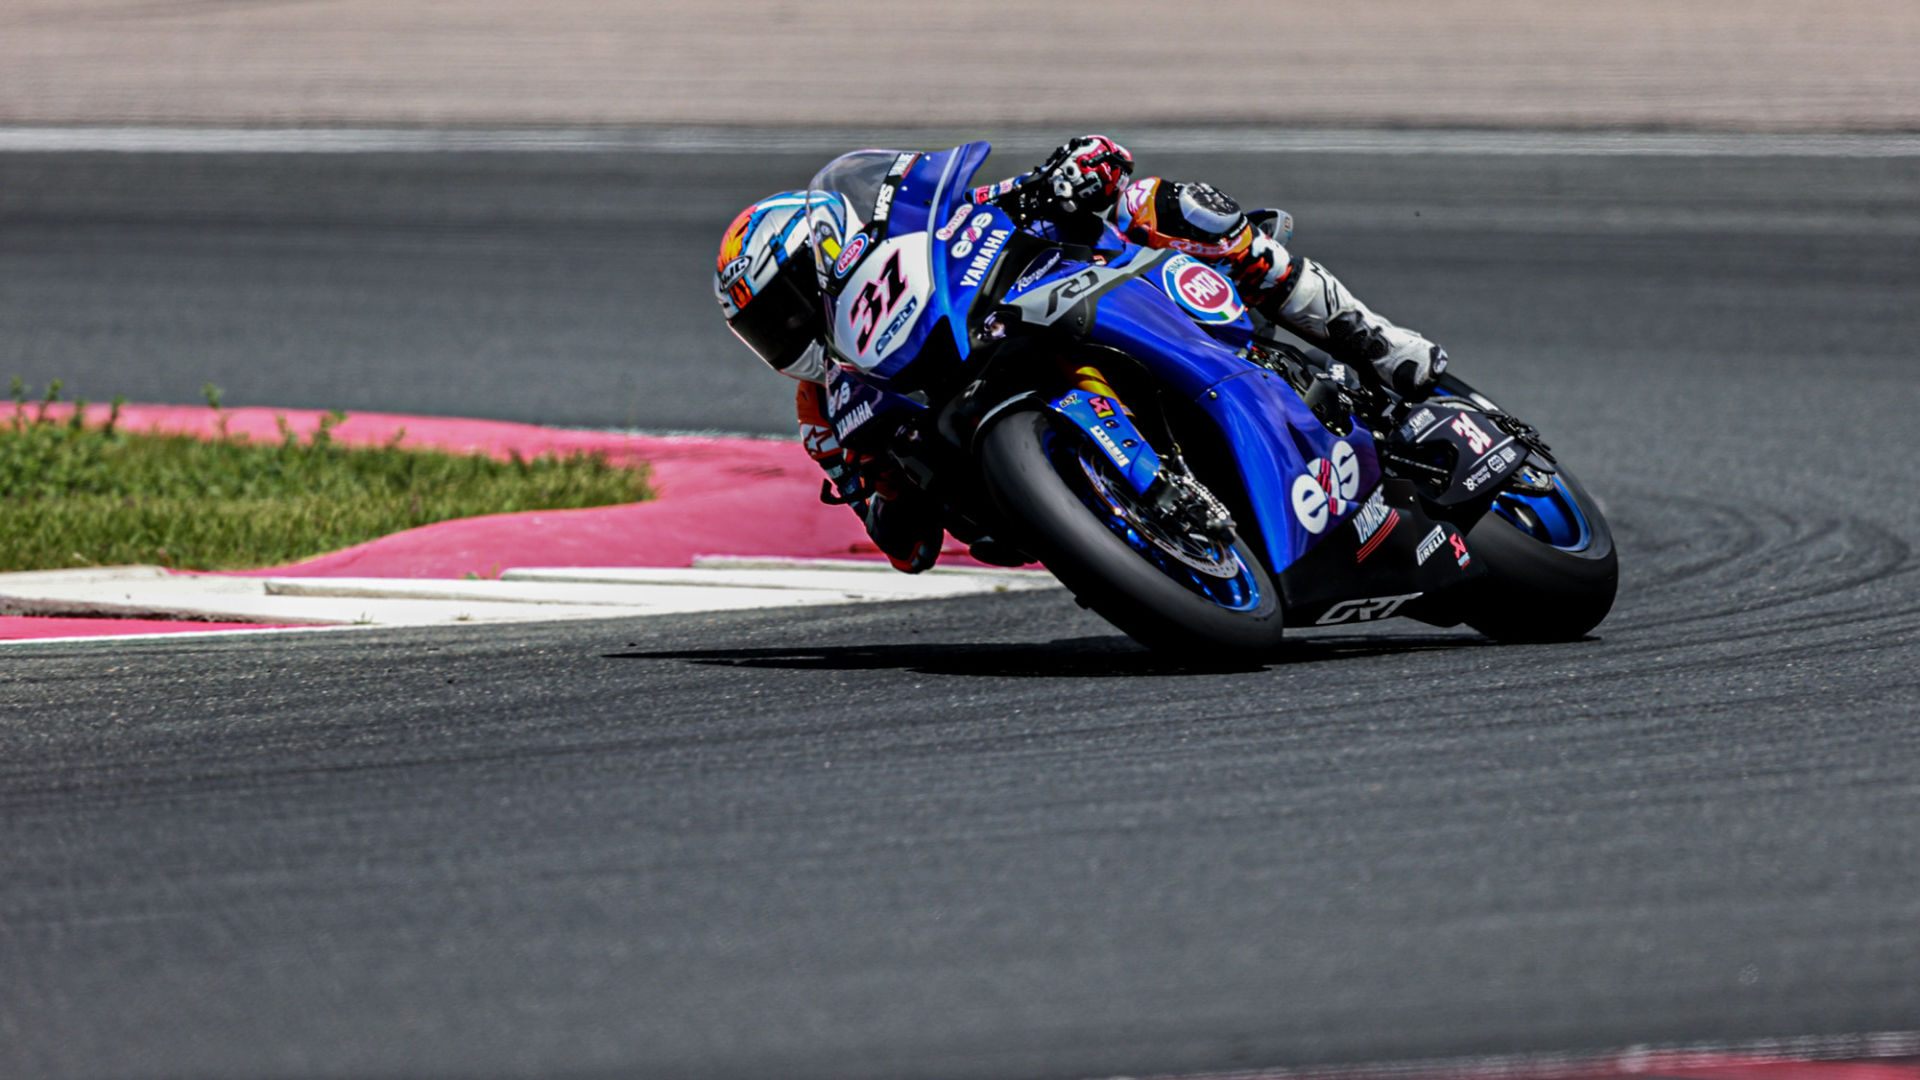 Garrett Gerloff (31) in action at Circuito de Navarra. Photo courtesy Dorna WorldSBK Press Office.